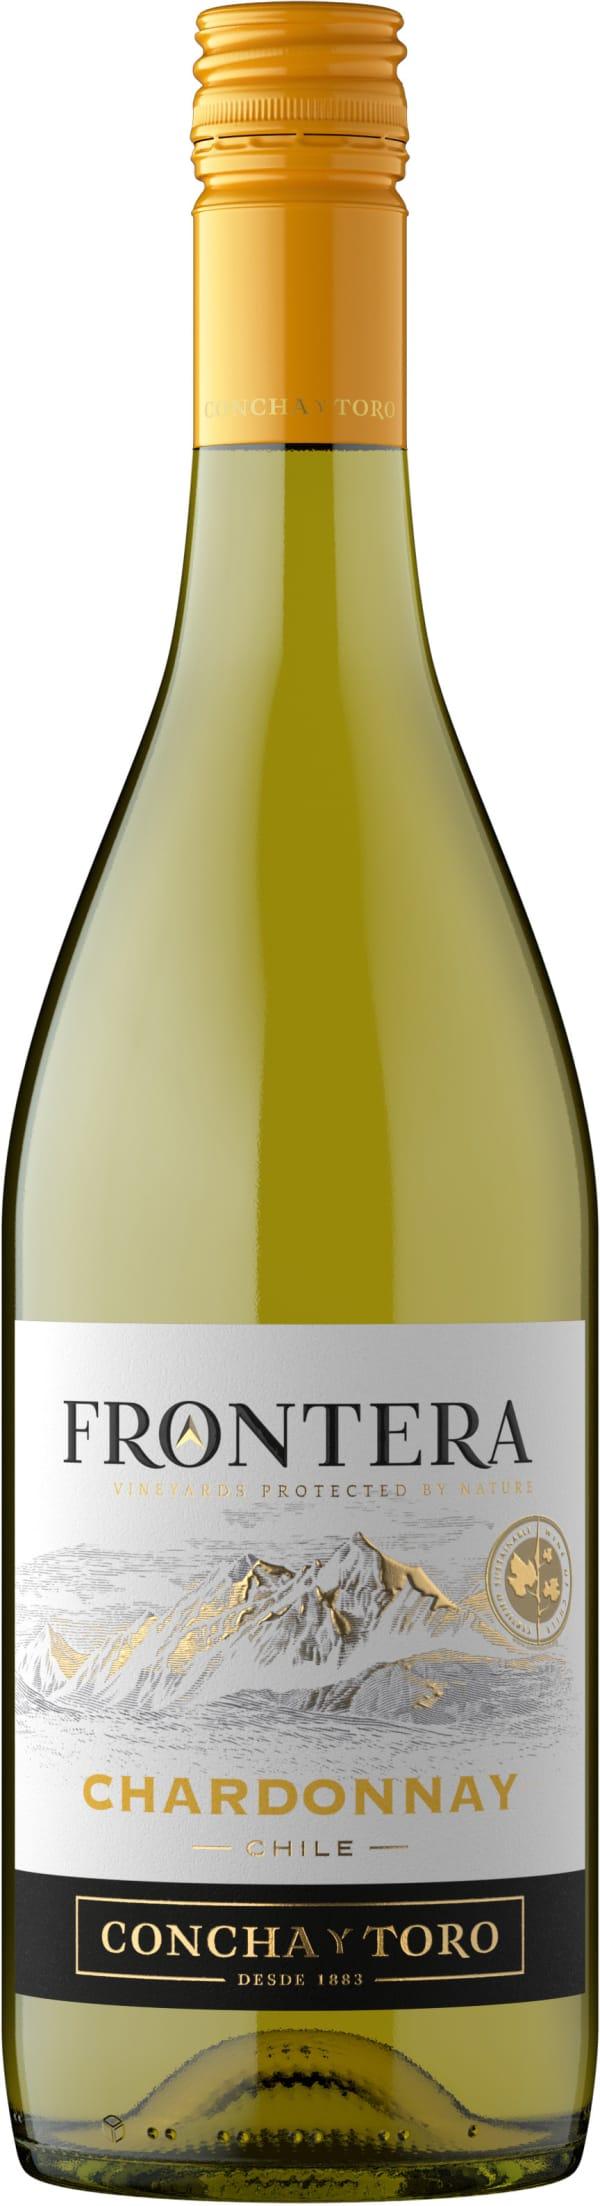 Frontera Chardonnay 2017